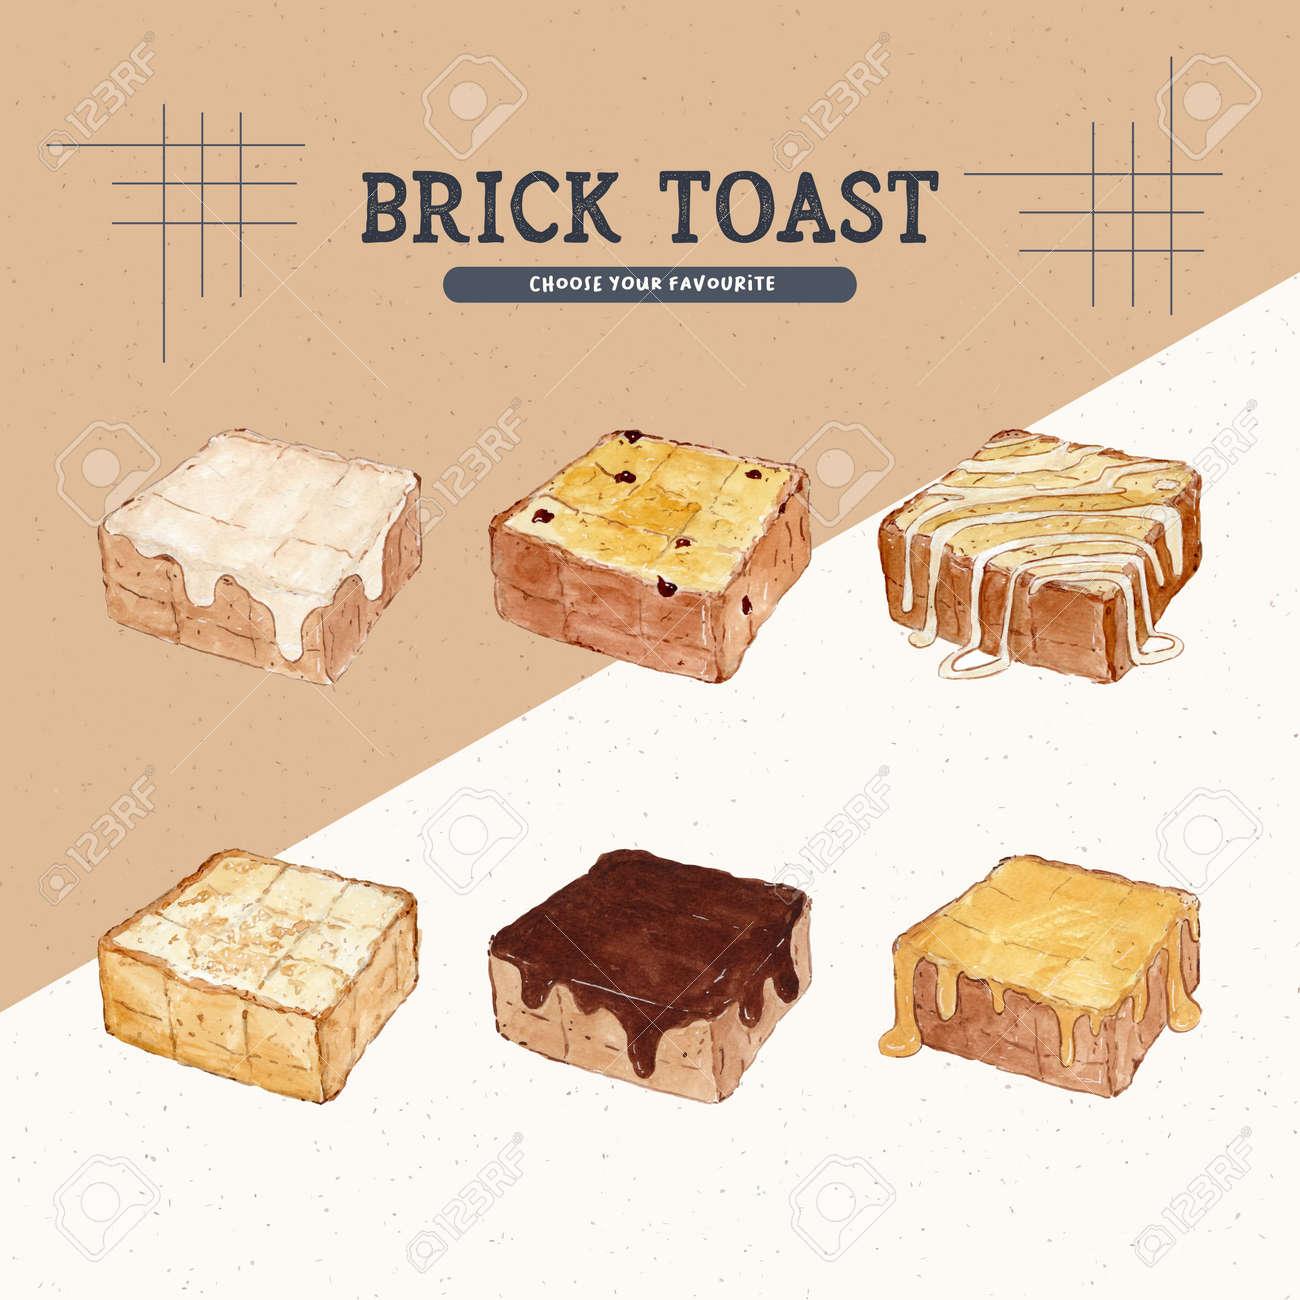 Brick toast, hand draw sketch vector. - 165340407